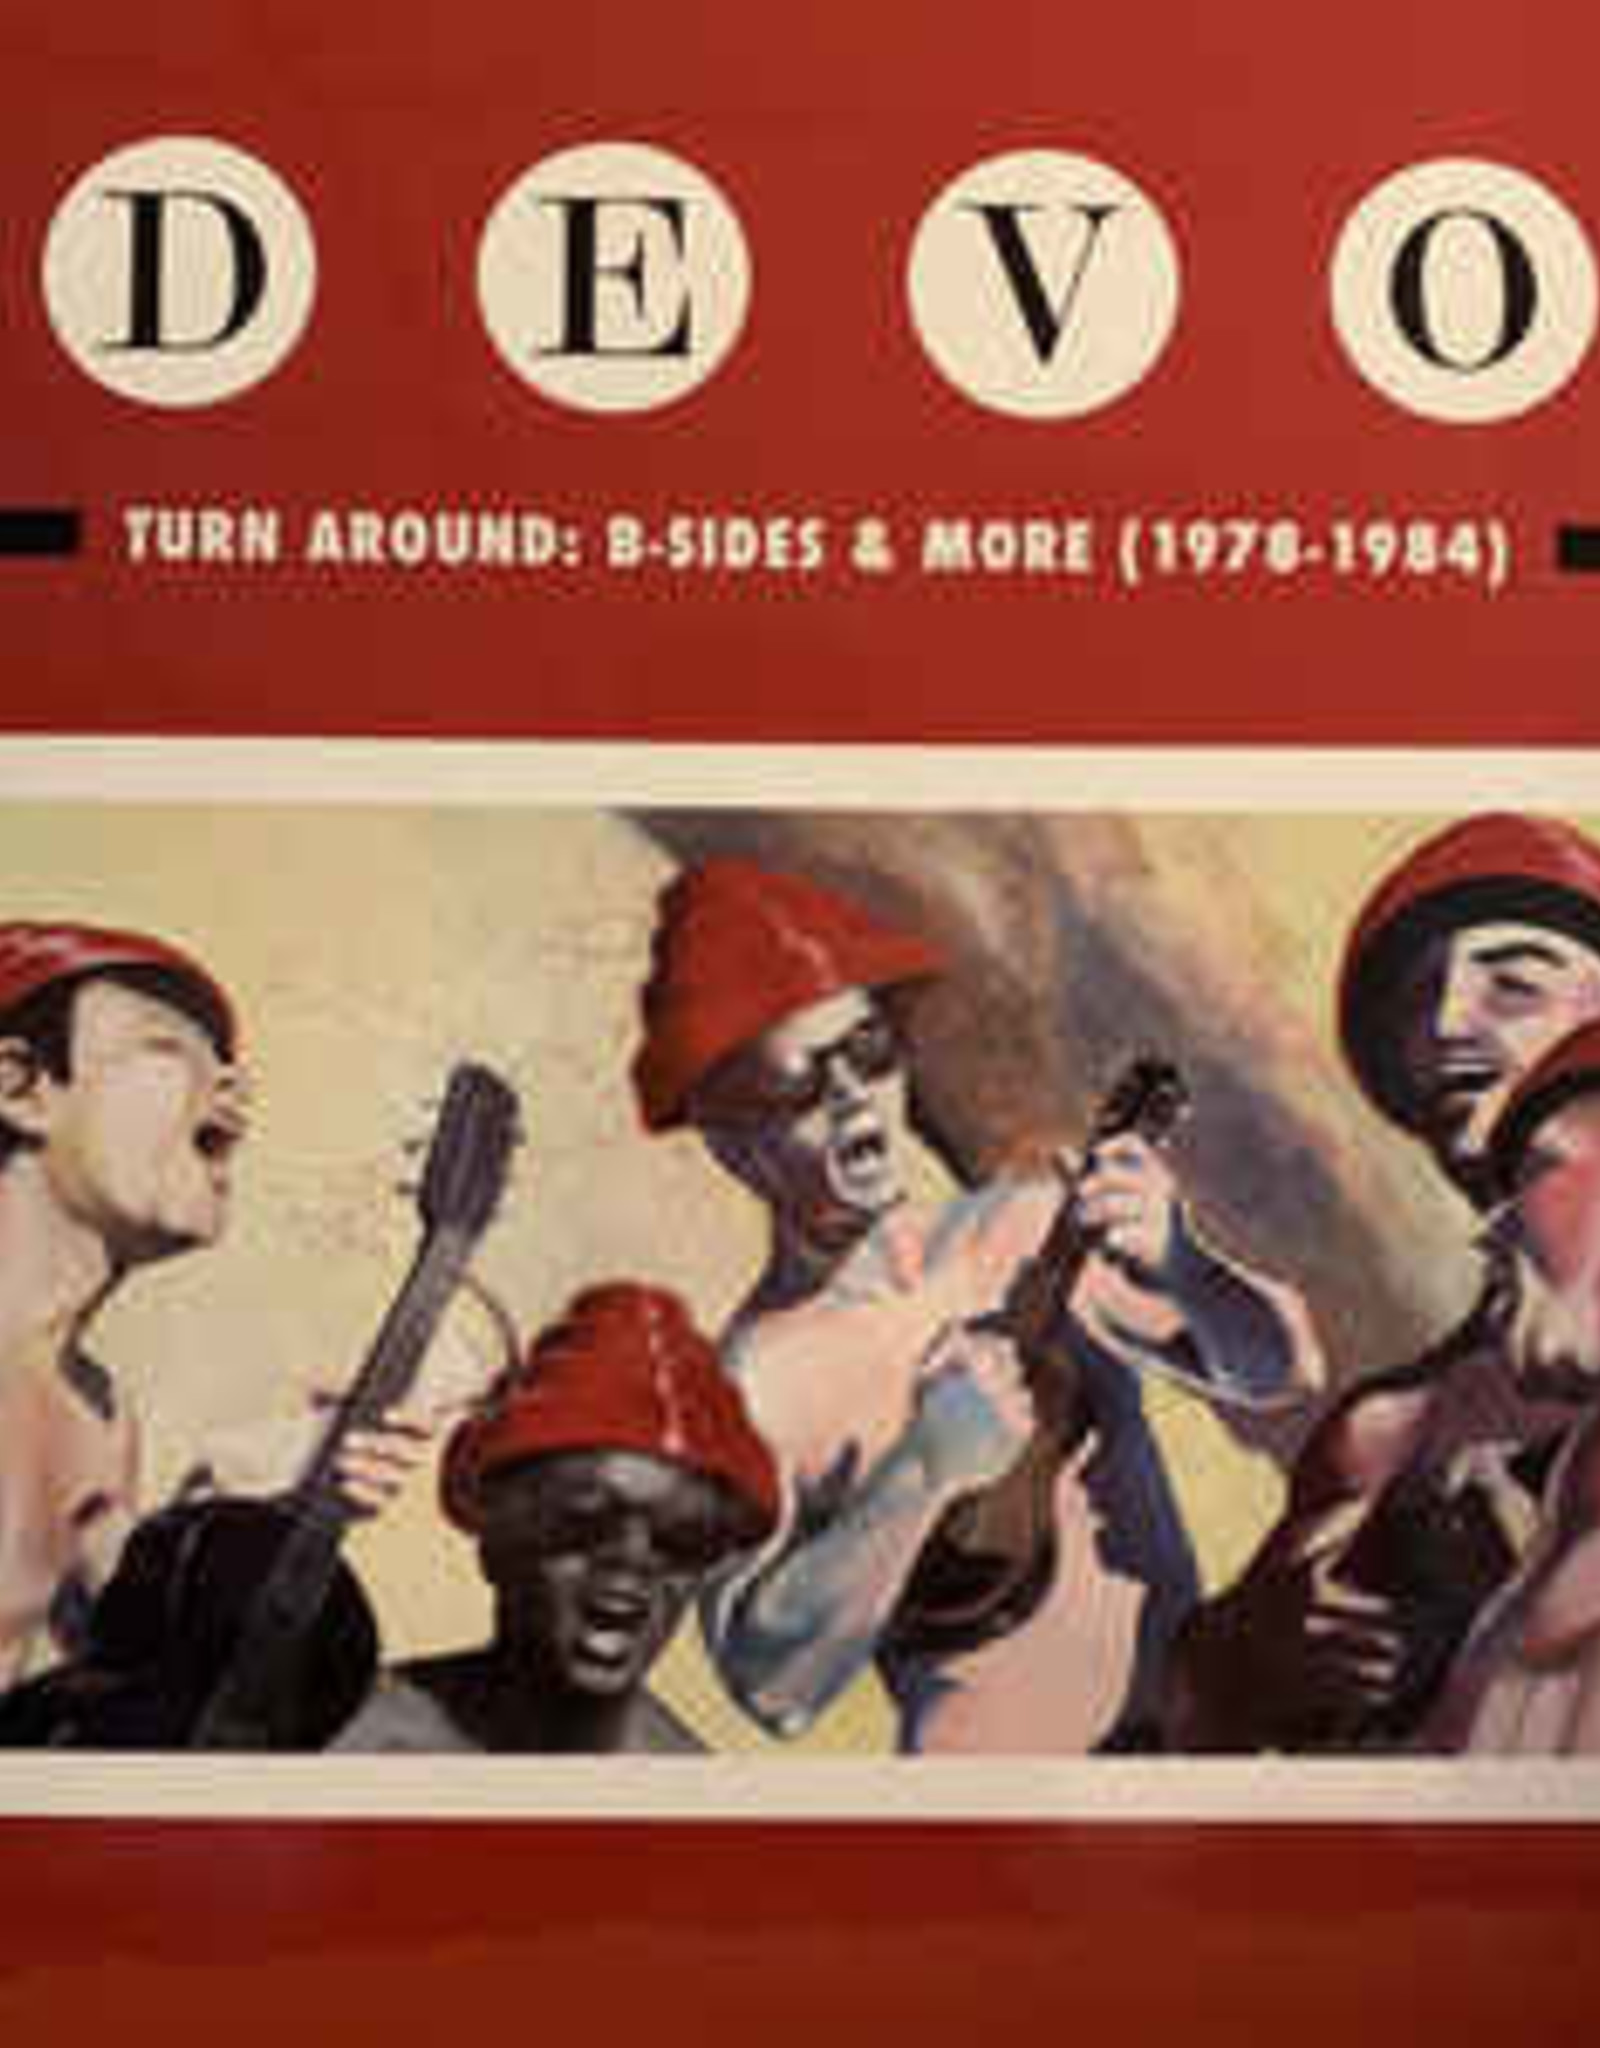 Devo - Turn Around: B-Sides & More 1978-1984 (Rog Limited Edition)